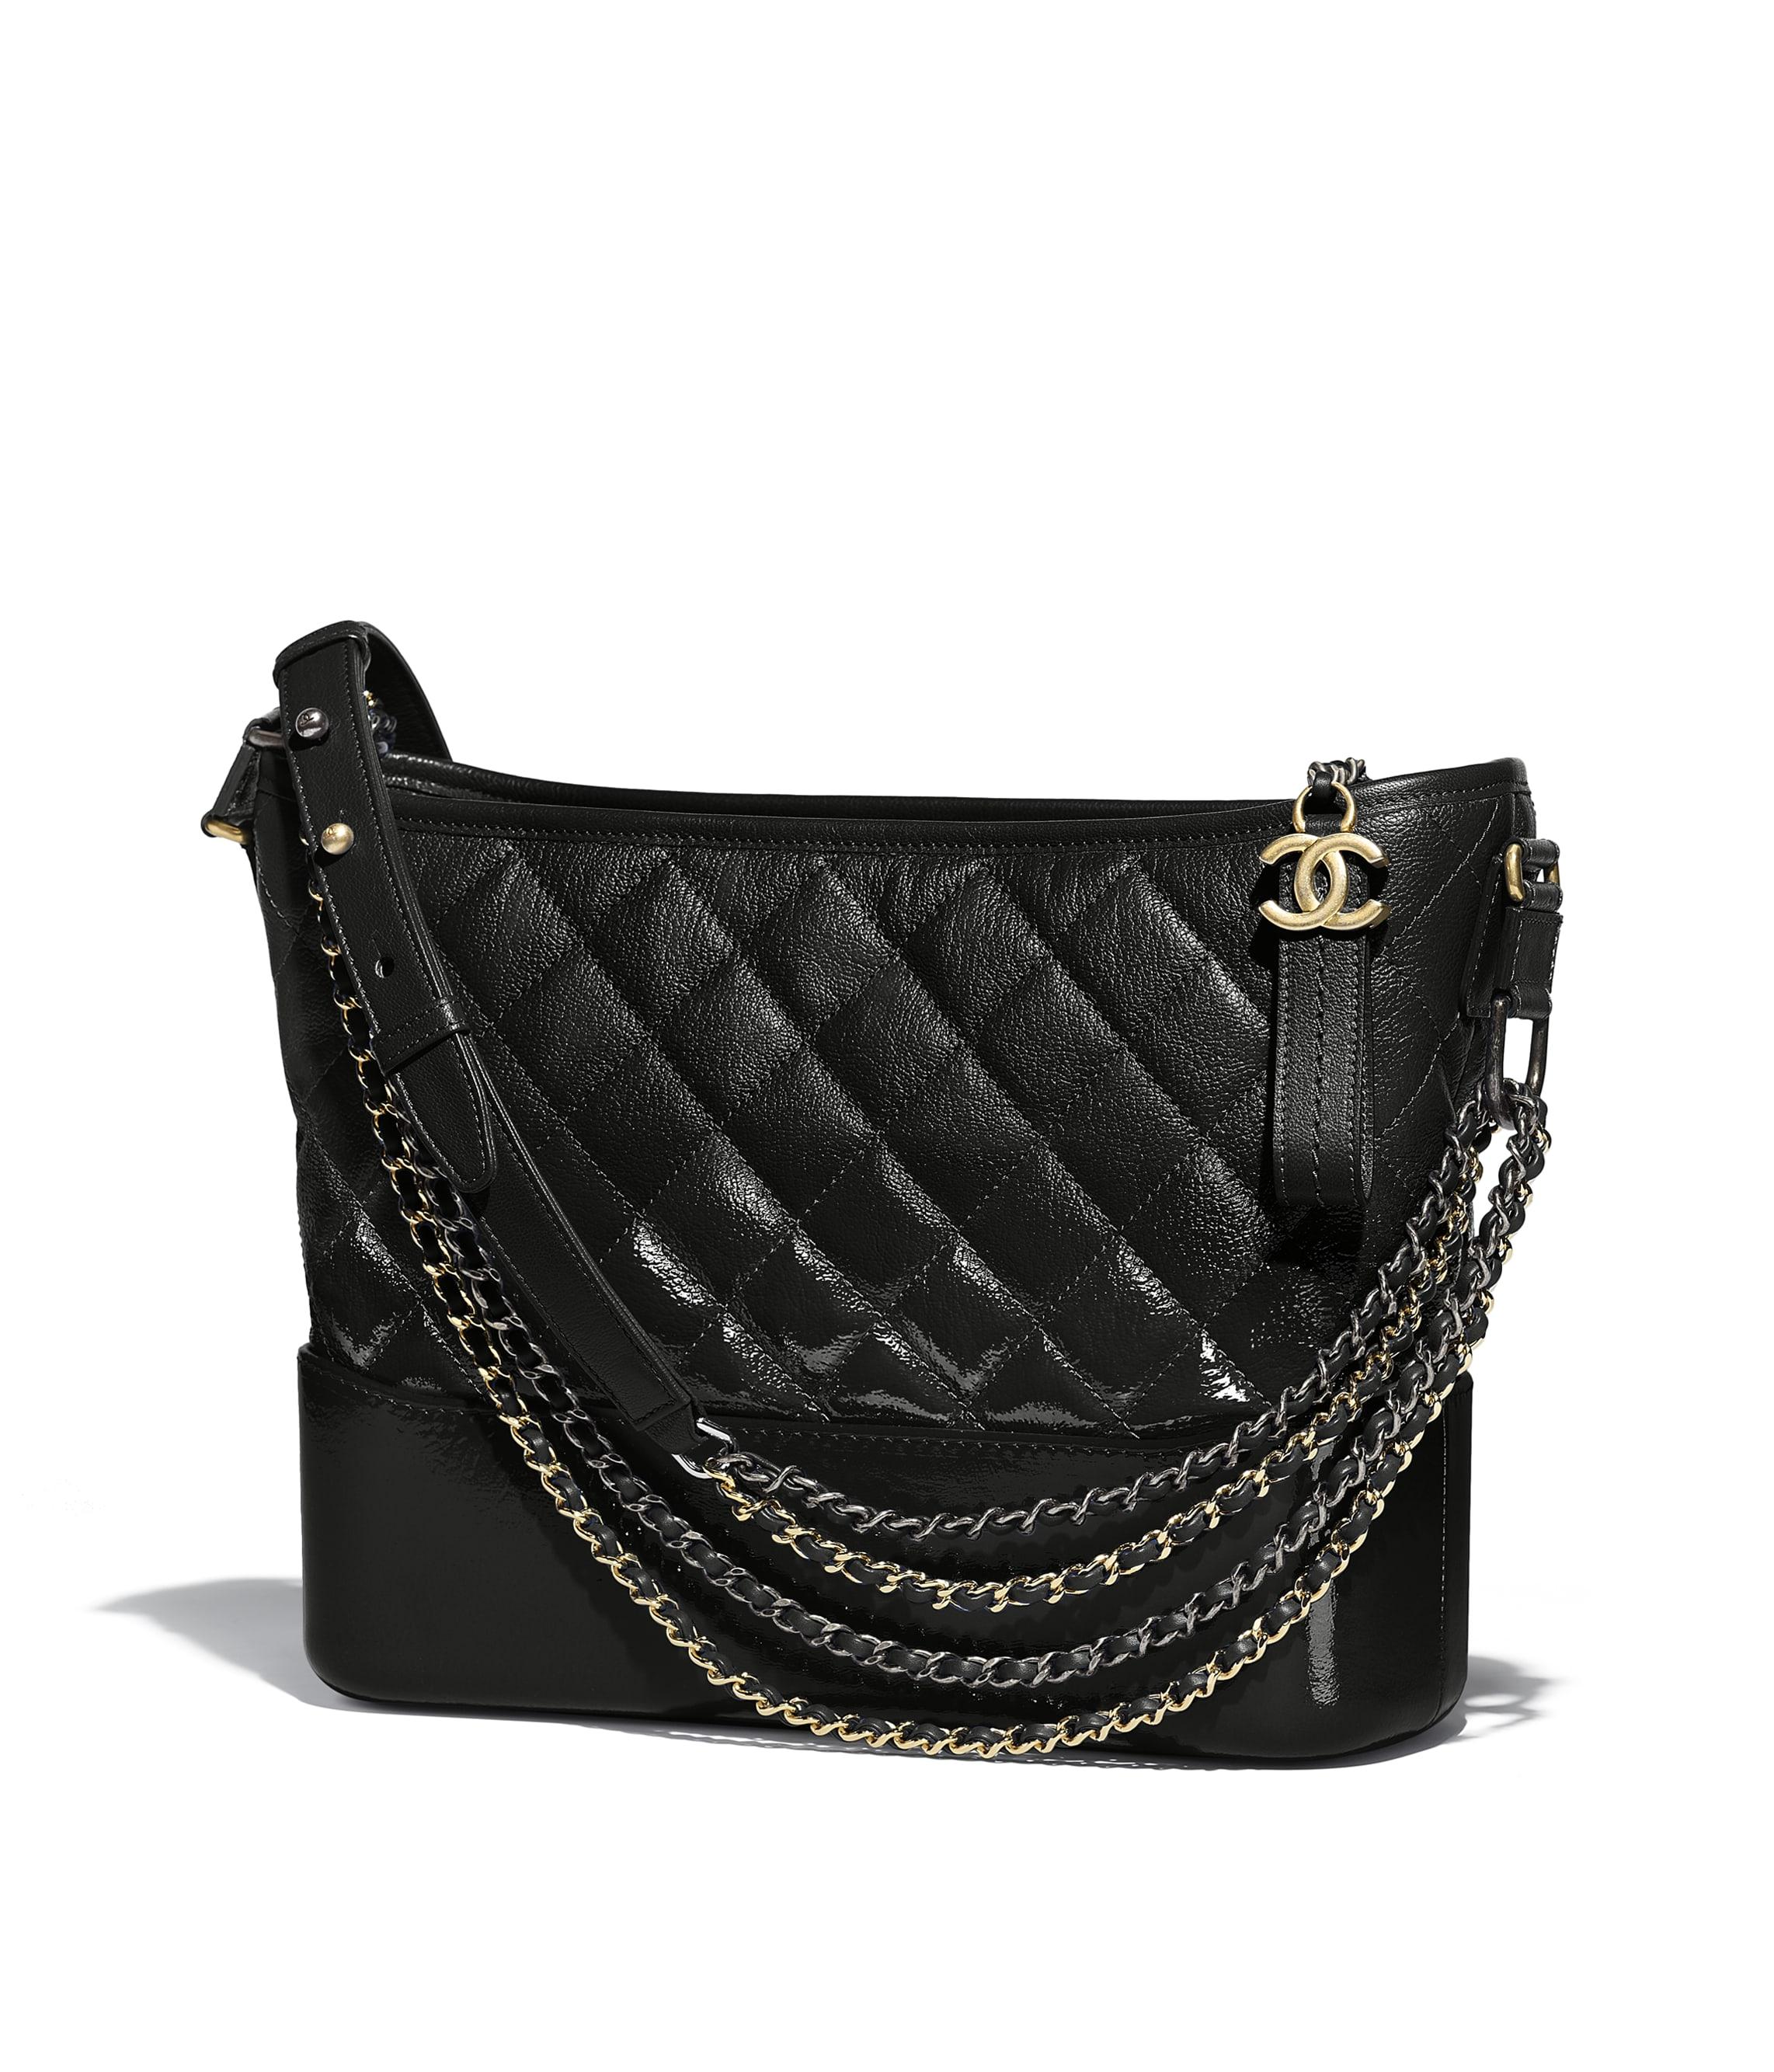 Hobo Handbag Chanel S Gabrielle